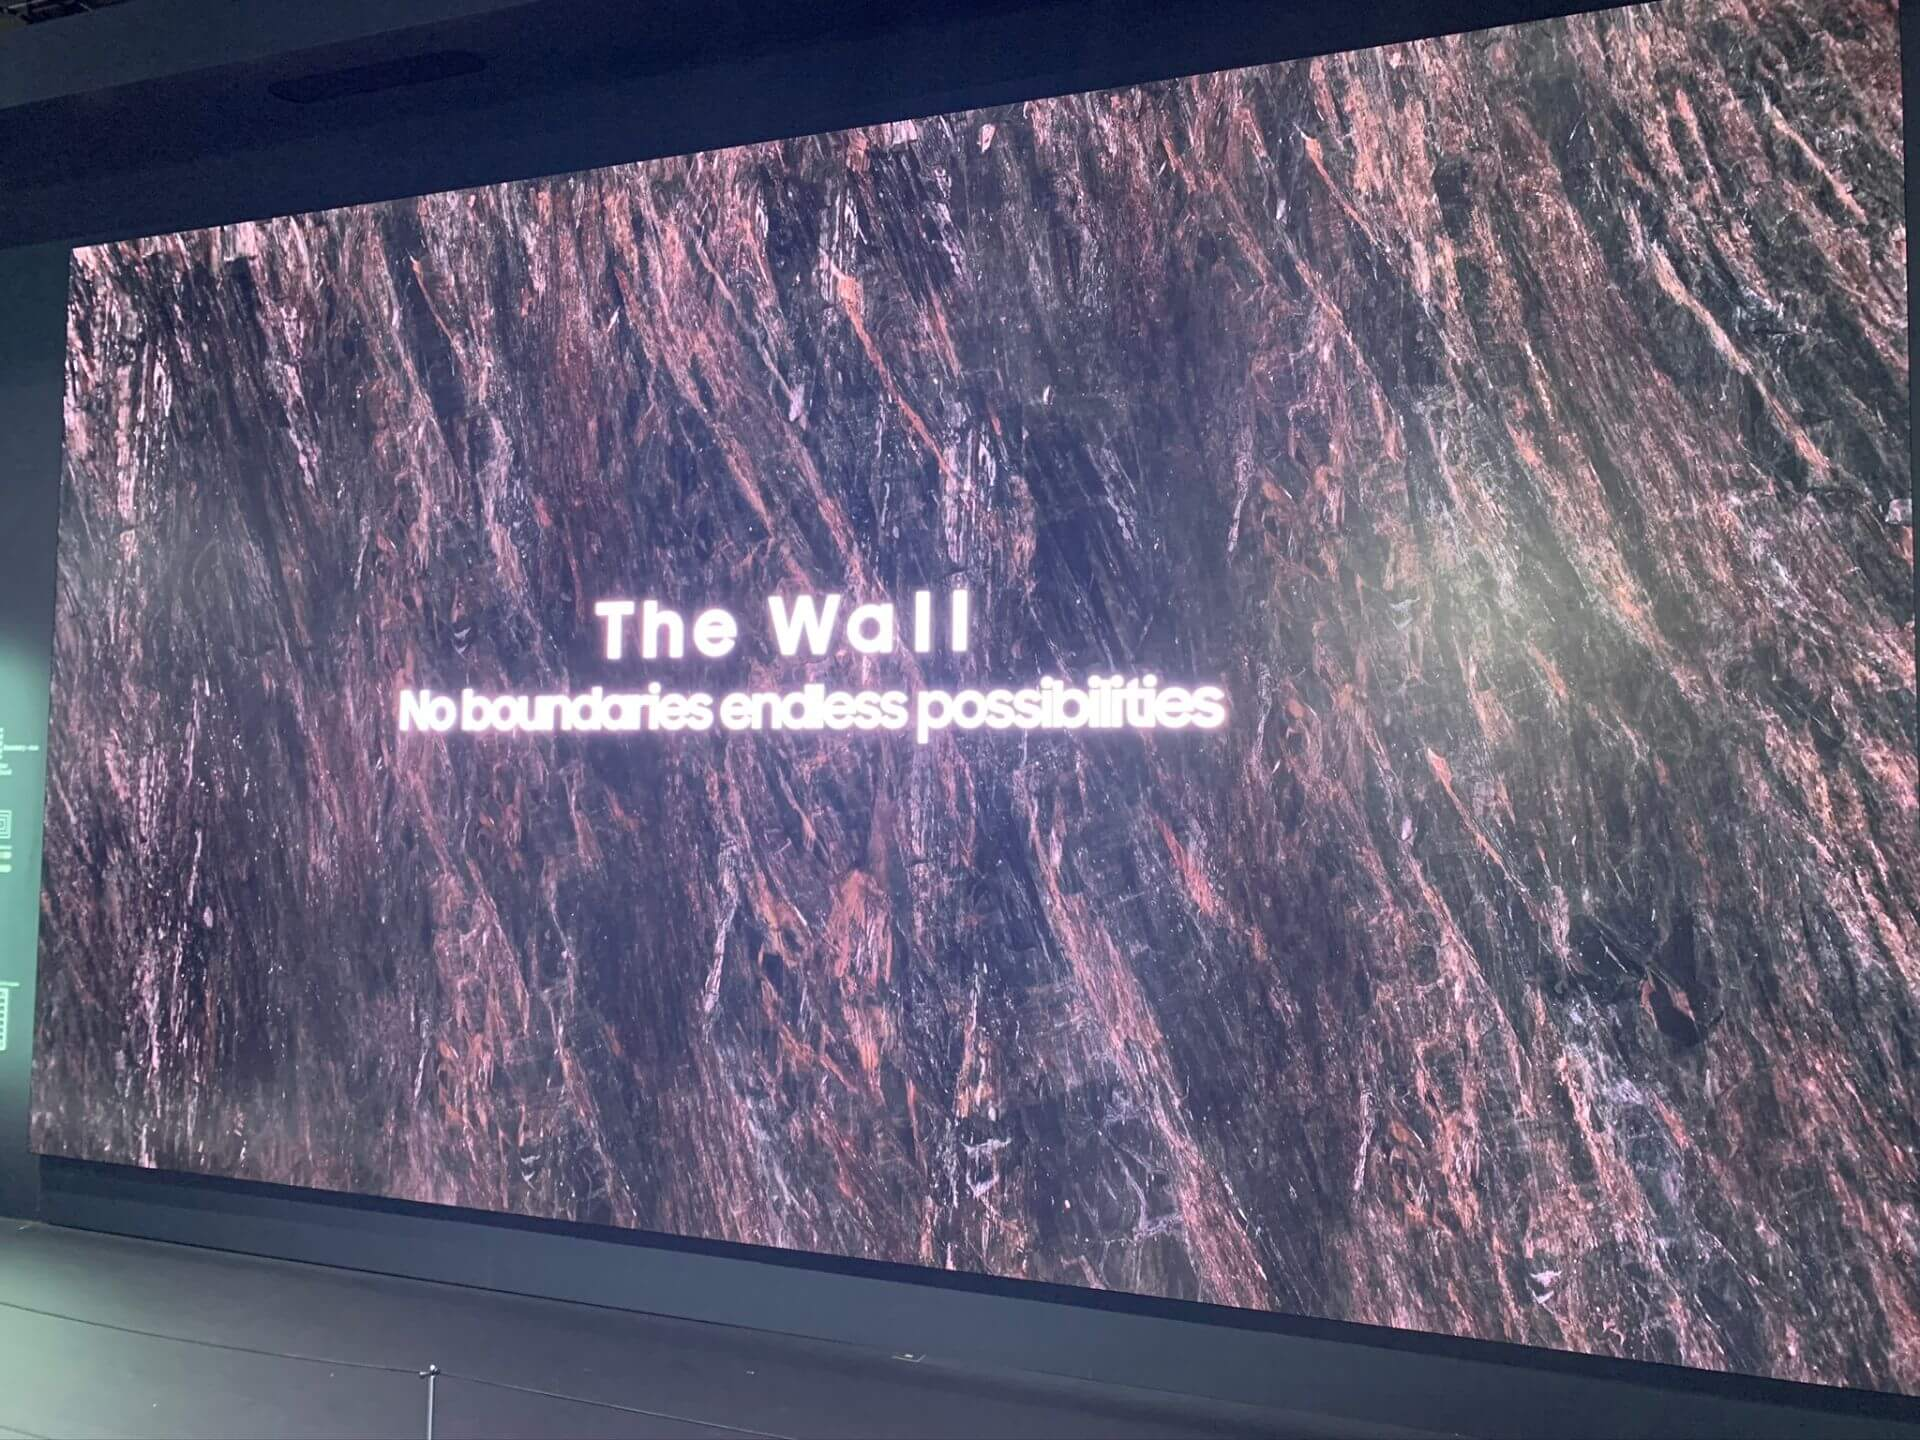 CES 2020:巨型8K屏幕——AI和摄像头无处不在